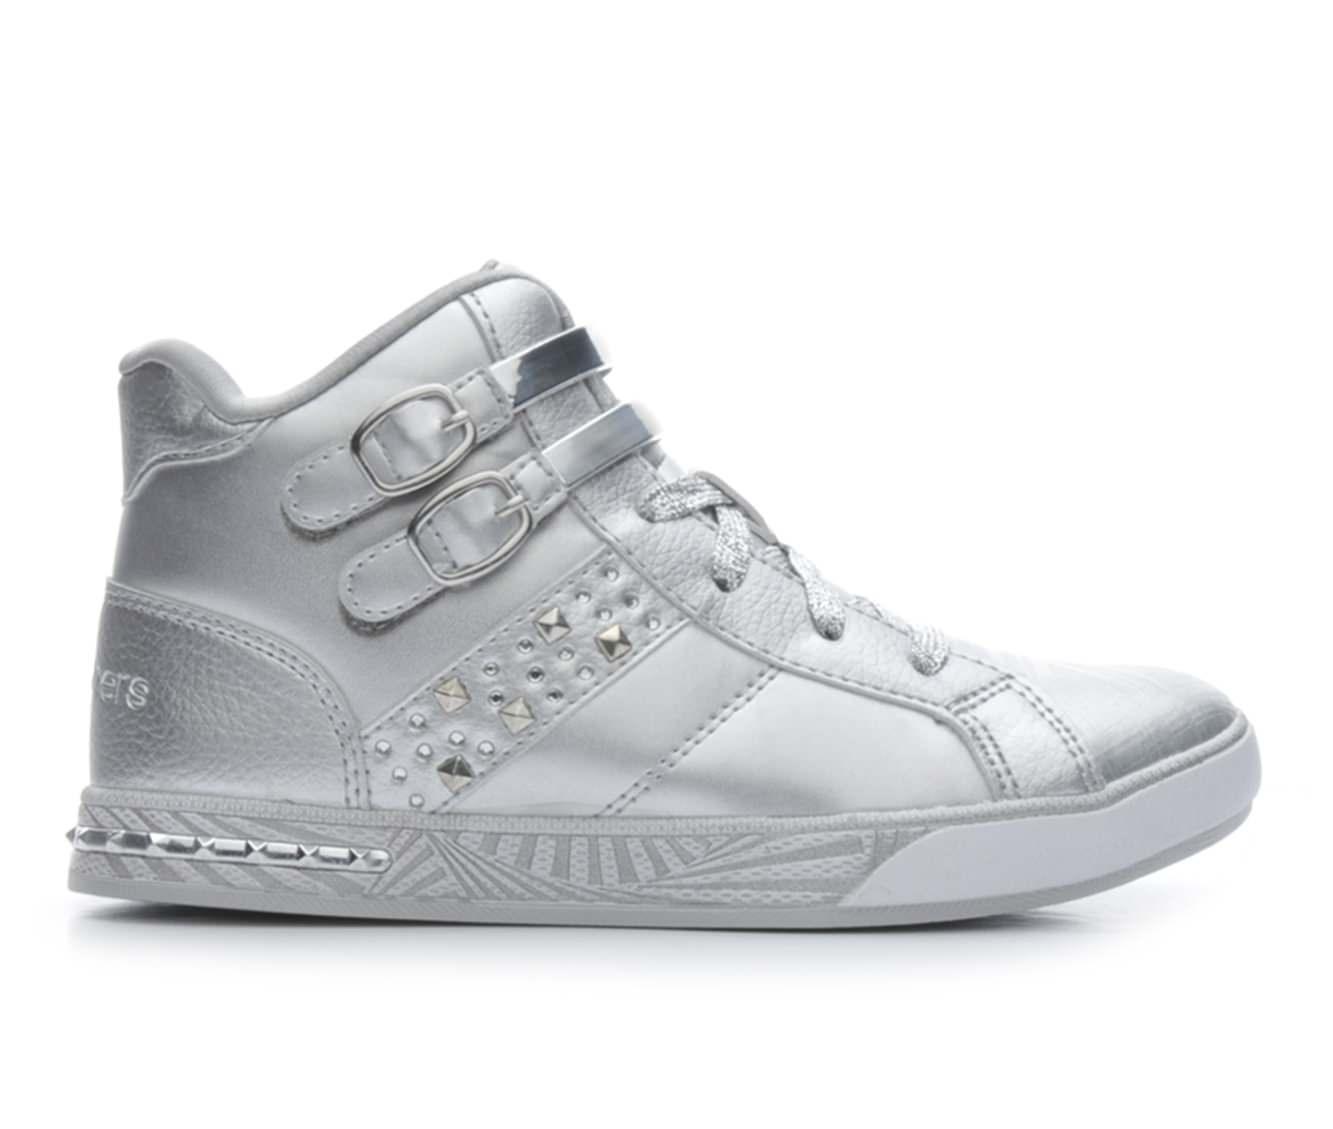 Girls' Skechers Sassy Kick Sneakers (Silver)